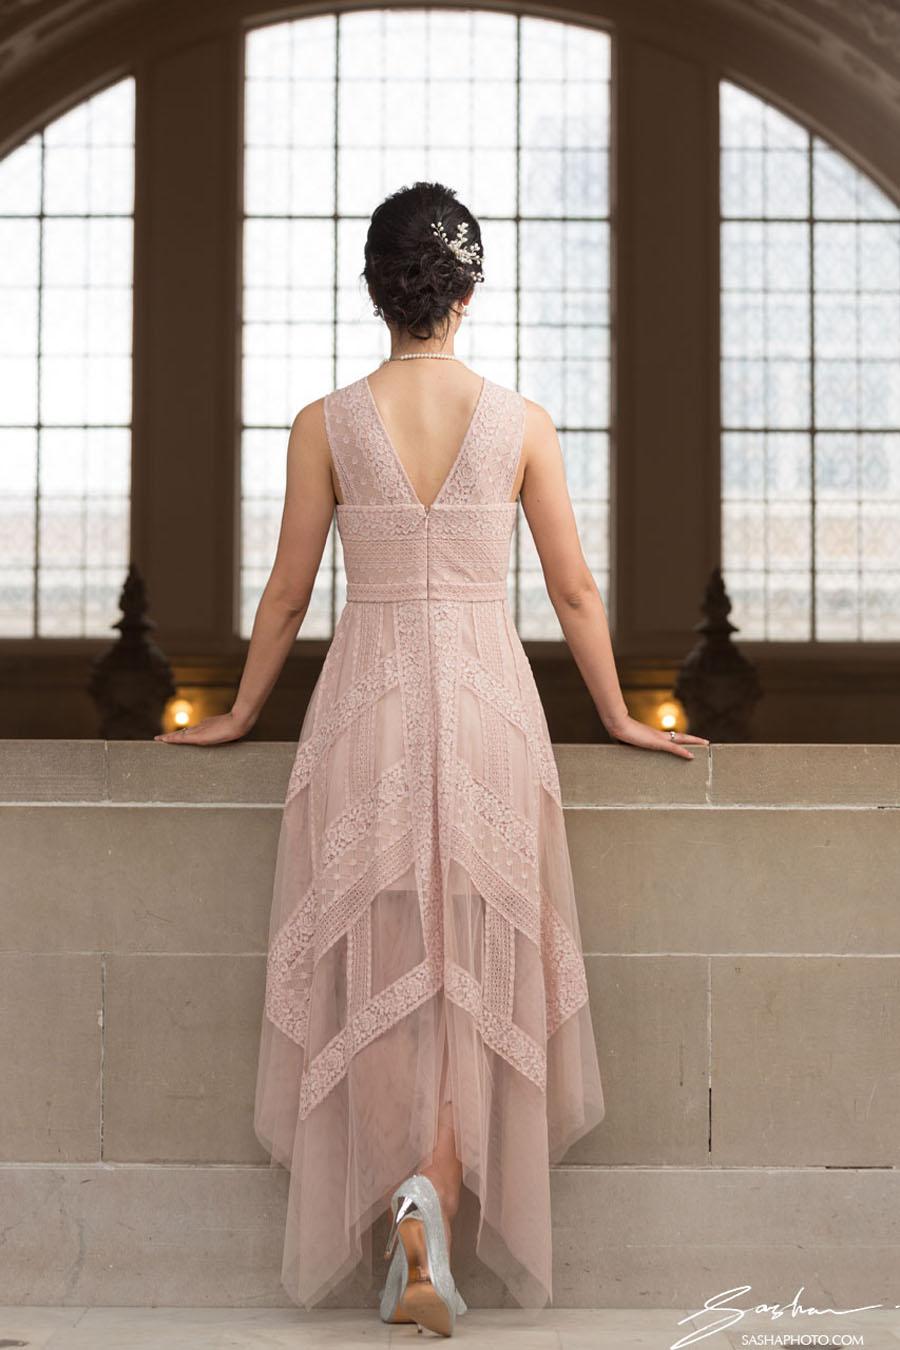 lace wedding dress sf city hall